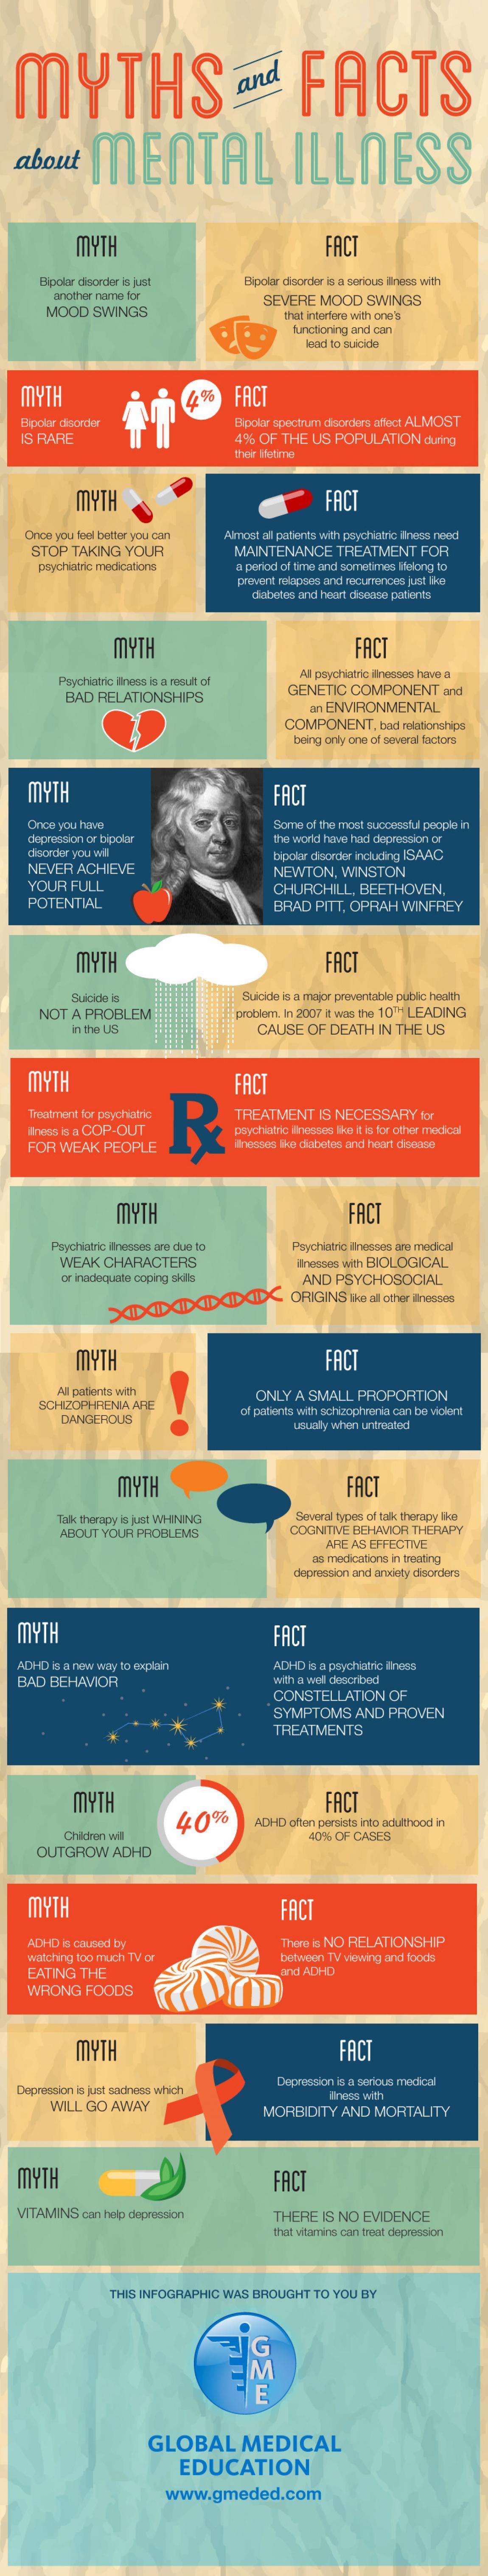 Mental Illness, Fact or Fiction